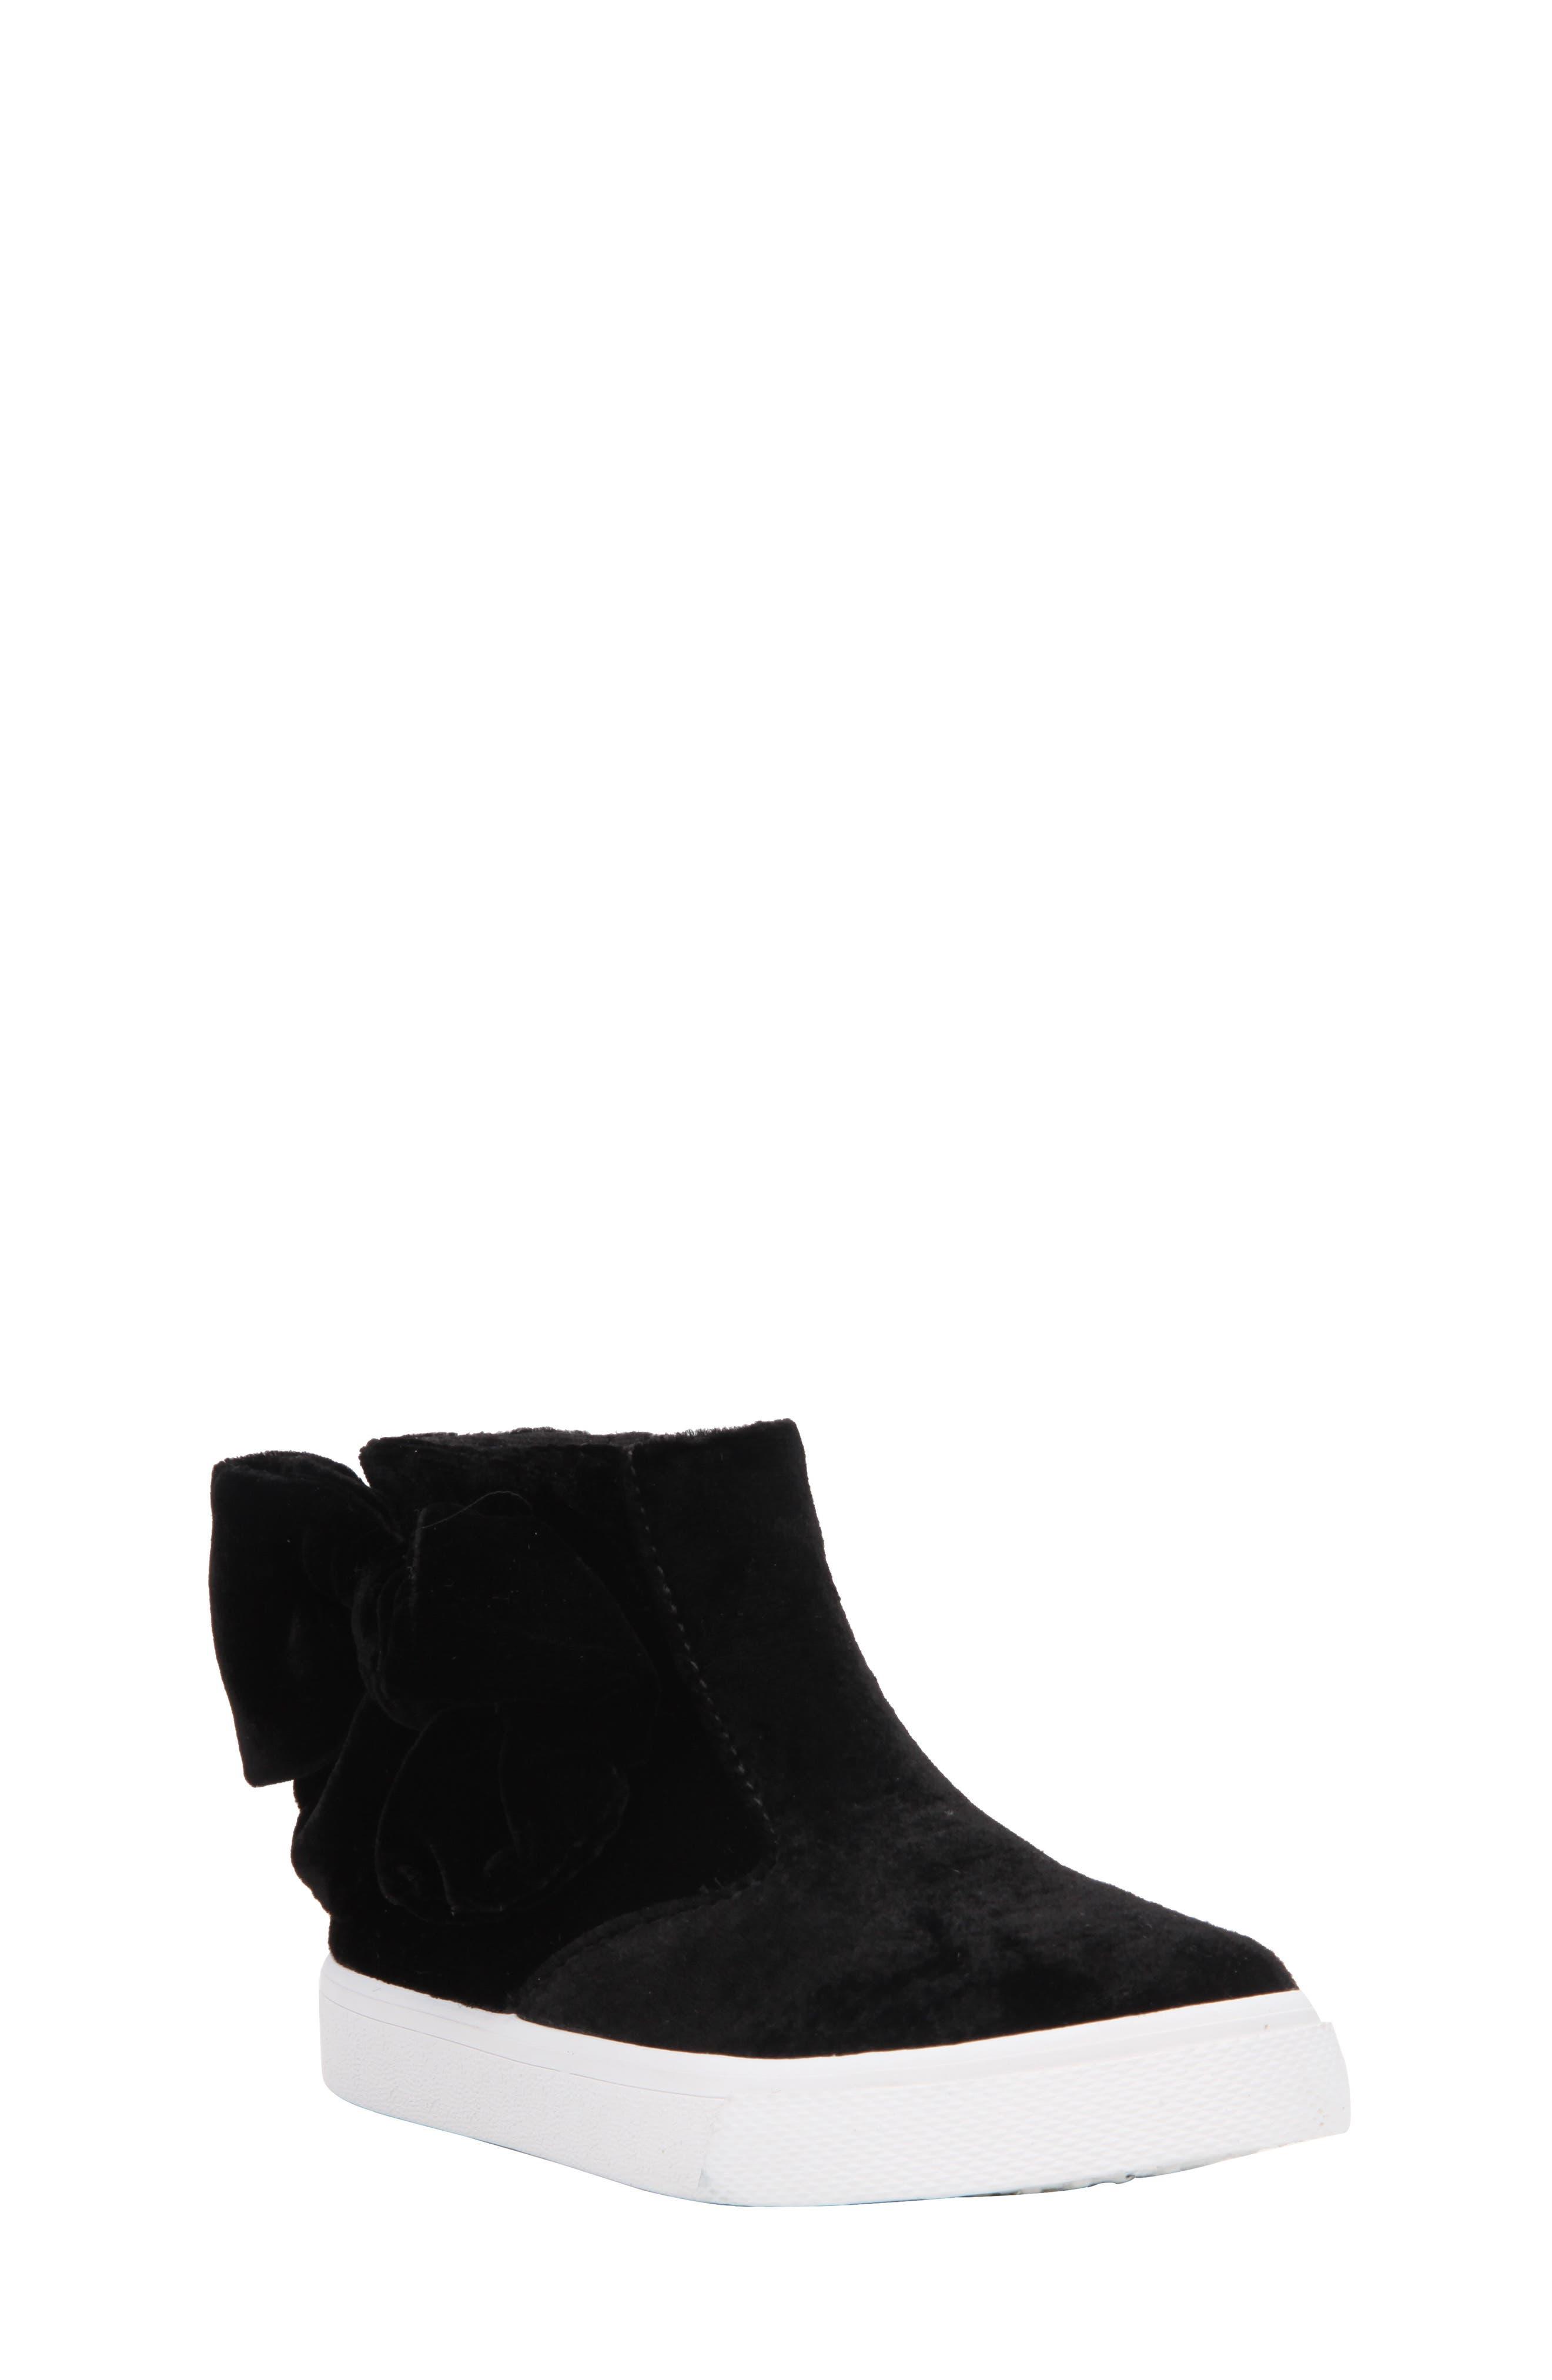 NINA Harolyn Bow Bootie Sneaker